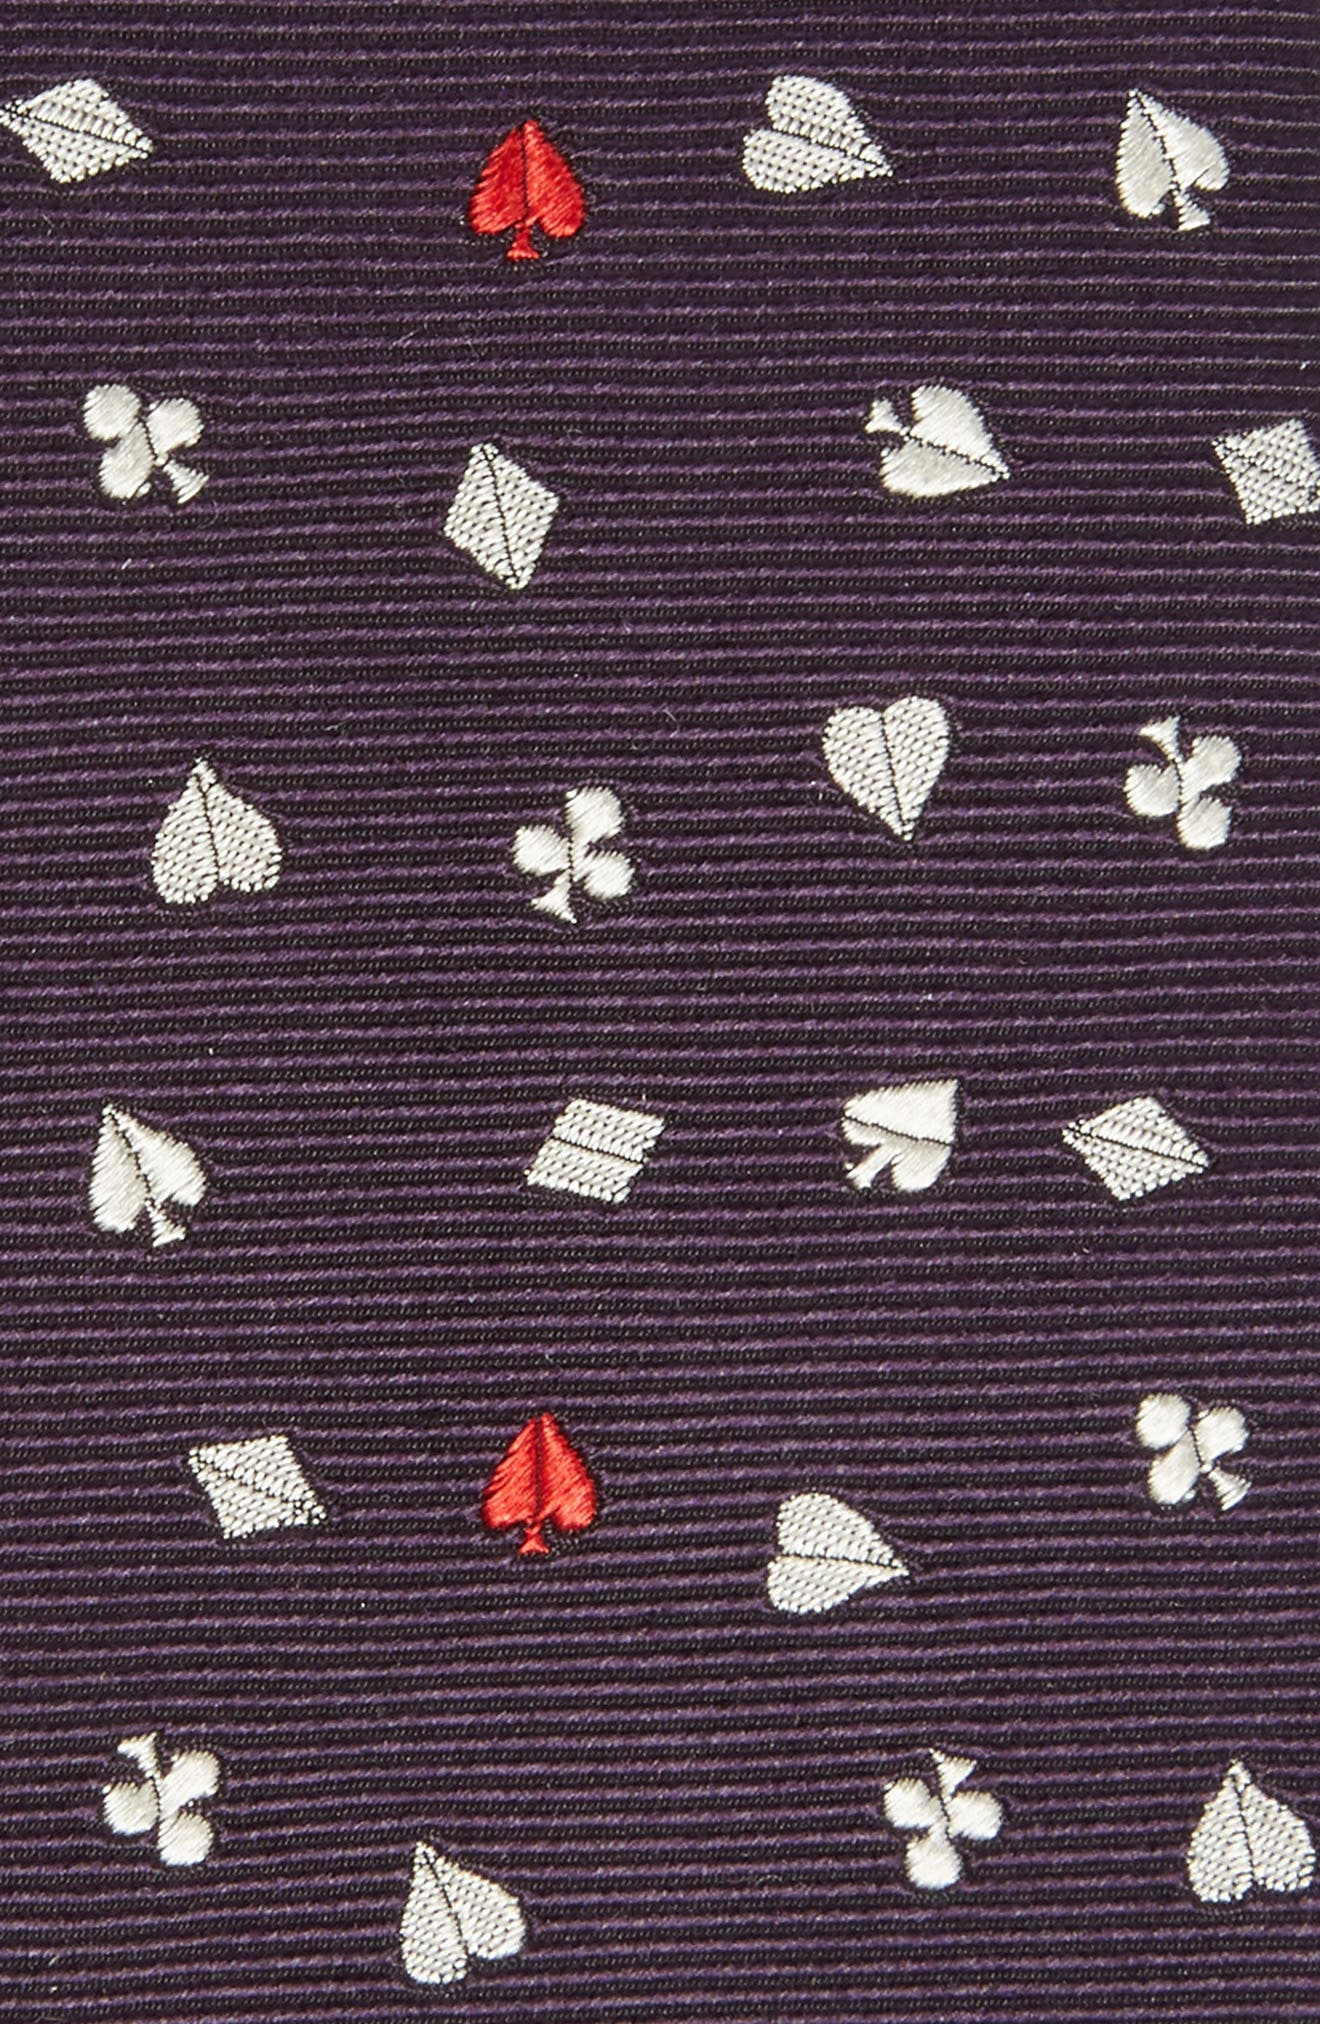 Poker Silk Skinny Tie,                             Alternate thumbnail 2, color,                             410